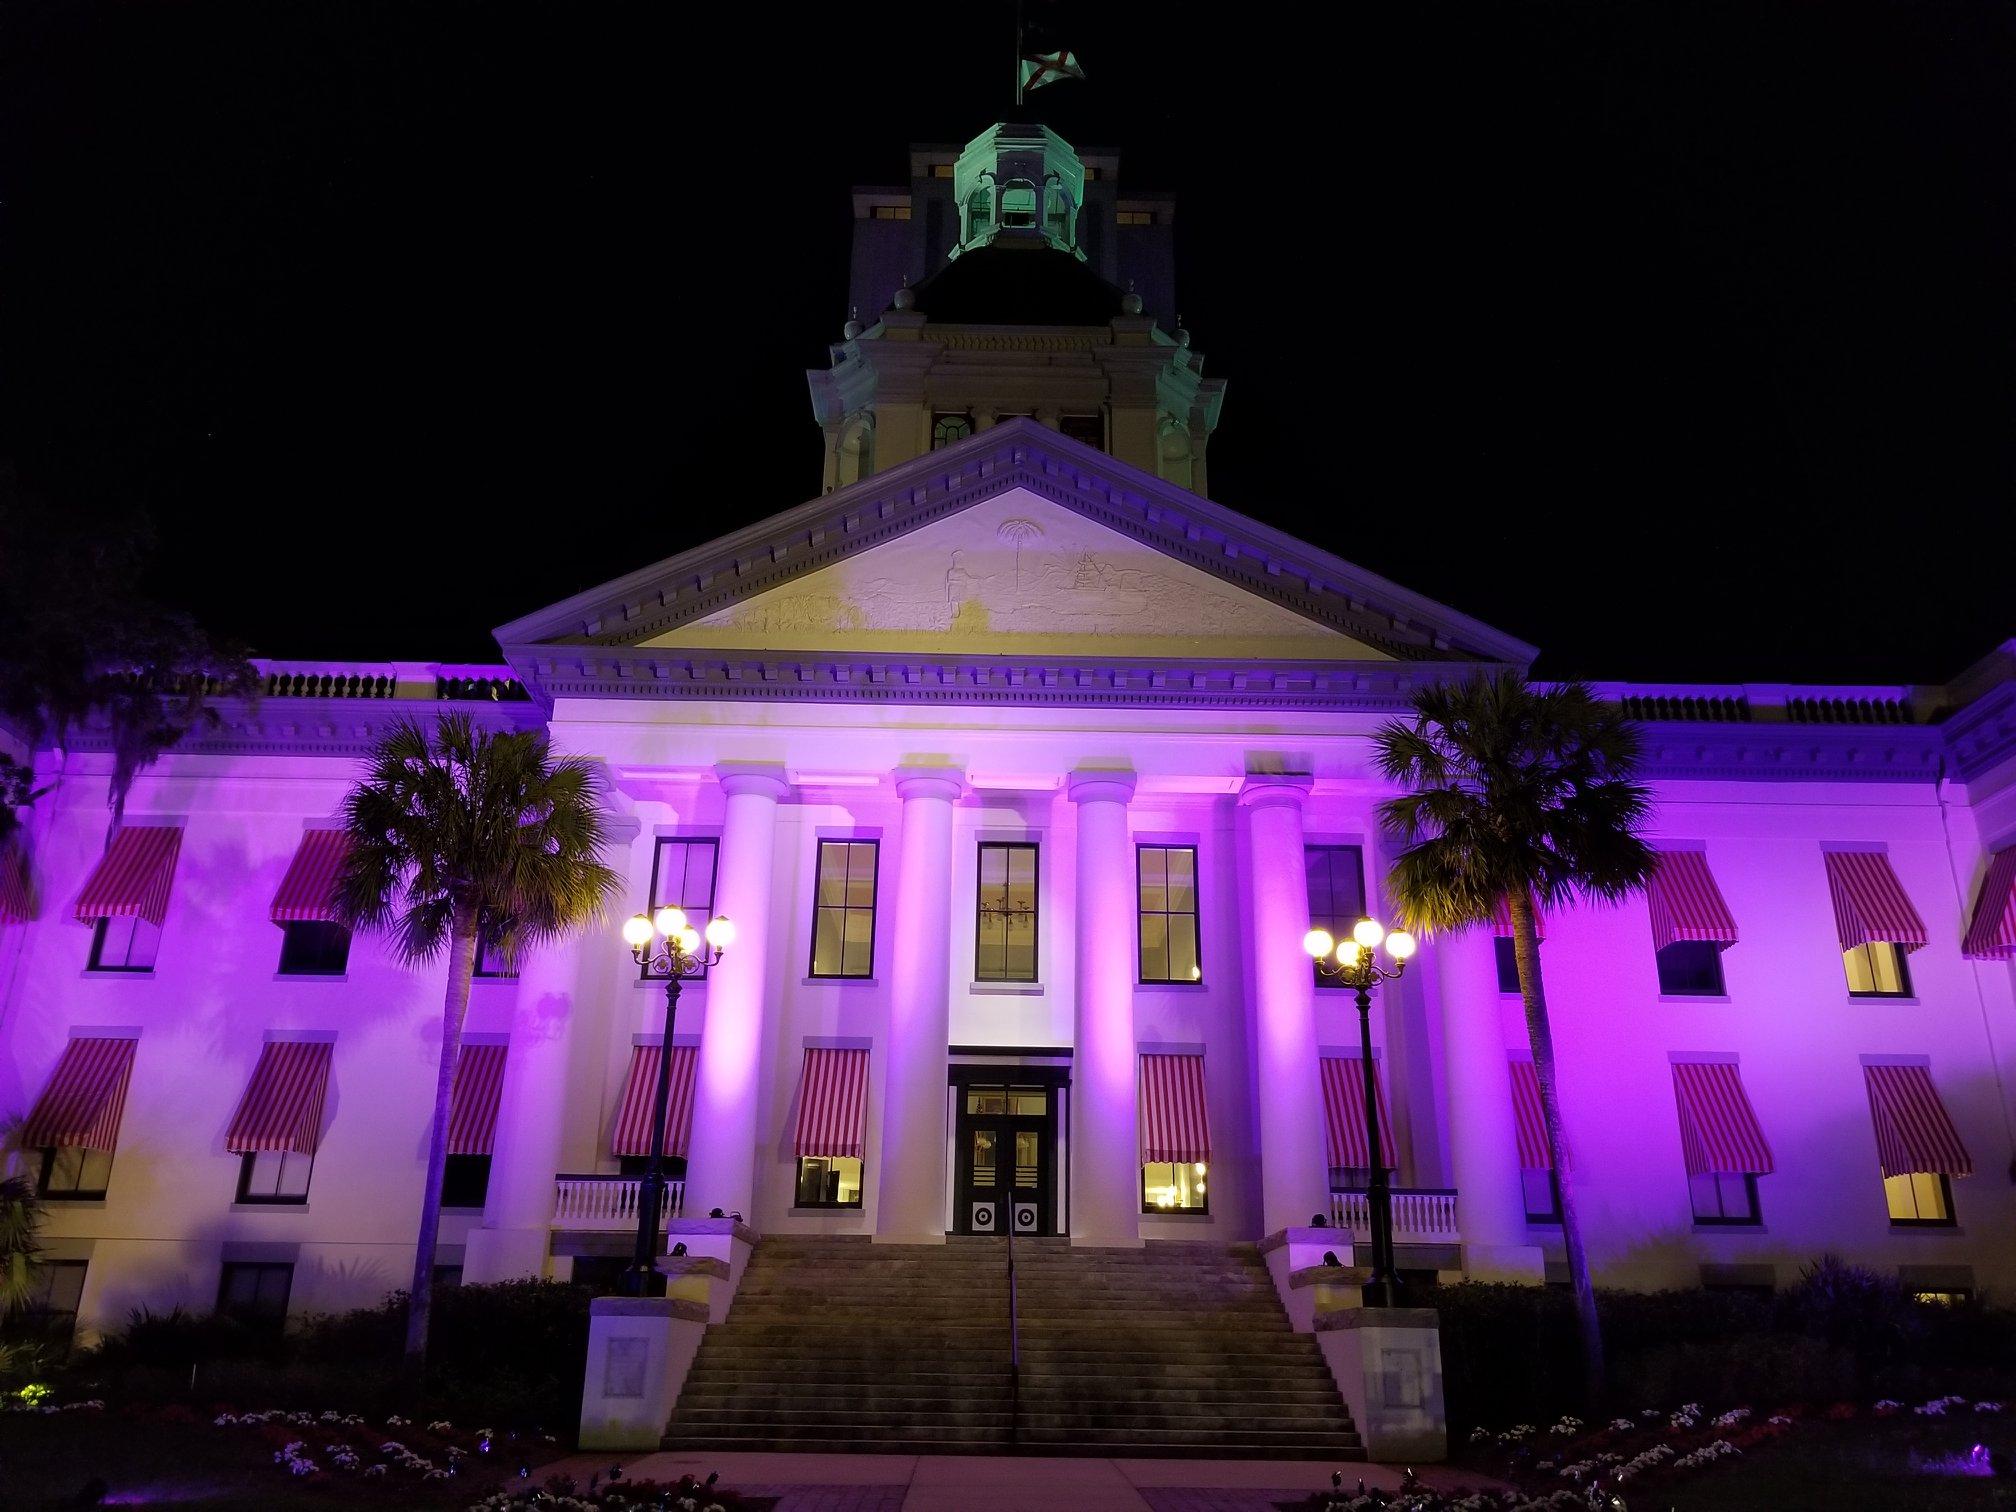 Marcys-Law-purple-capitol.jpg